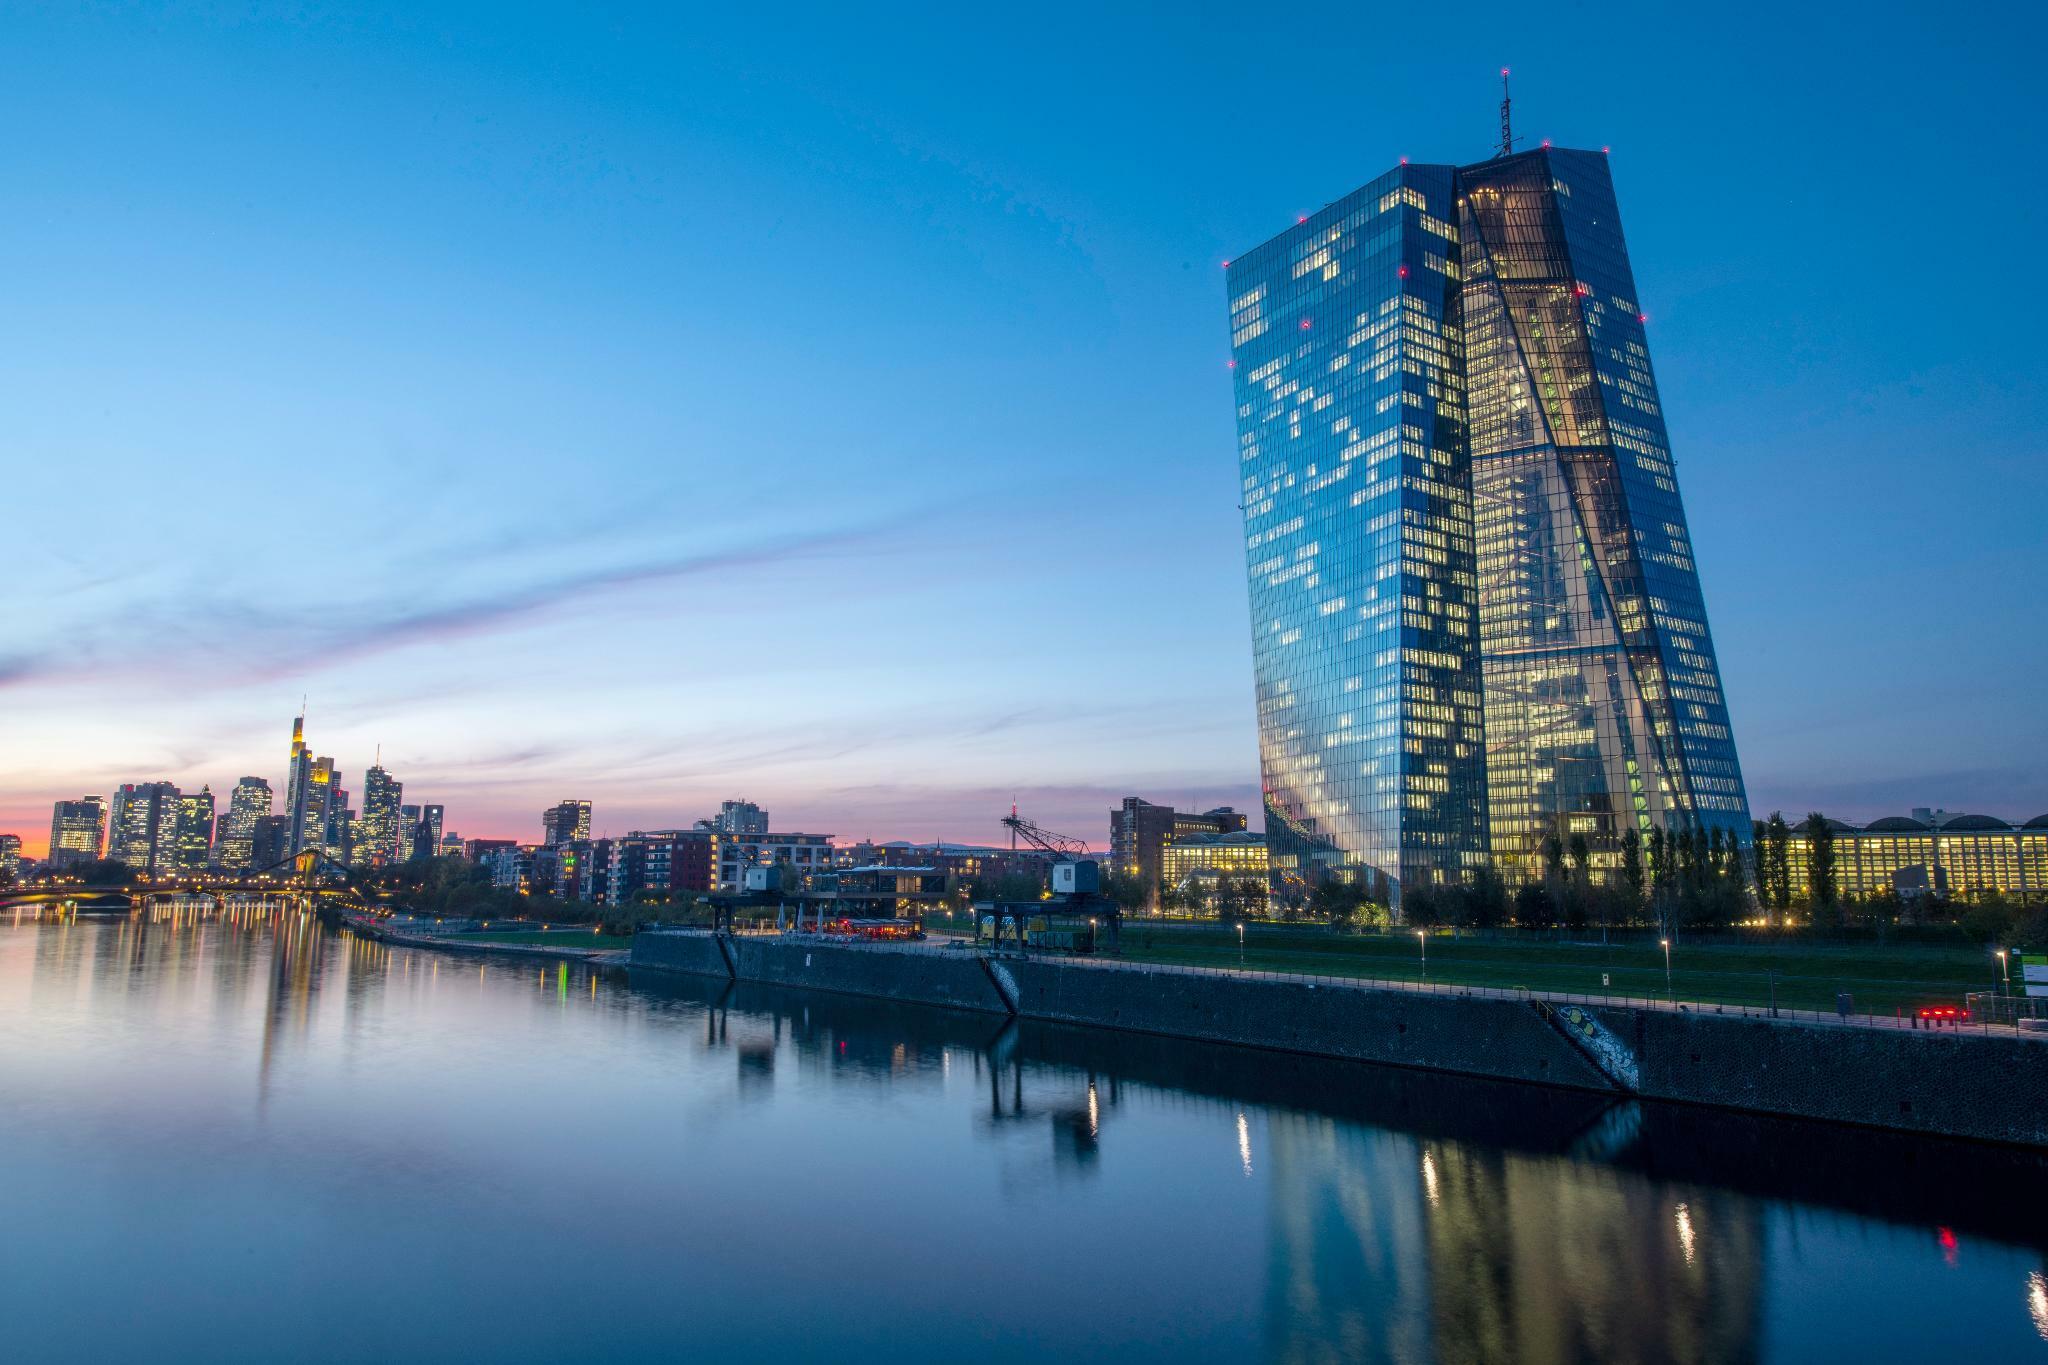 EZB: Anleihenkäufe werden laut Direktor Benoit Coeure fortgesetzt